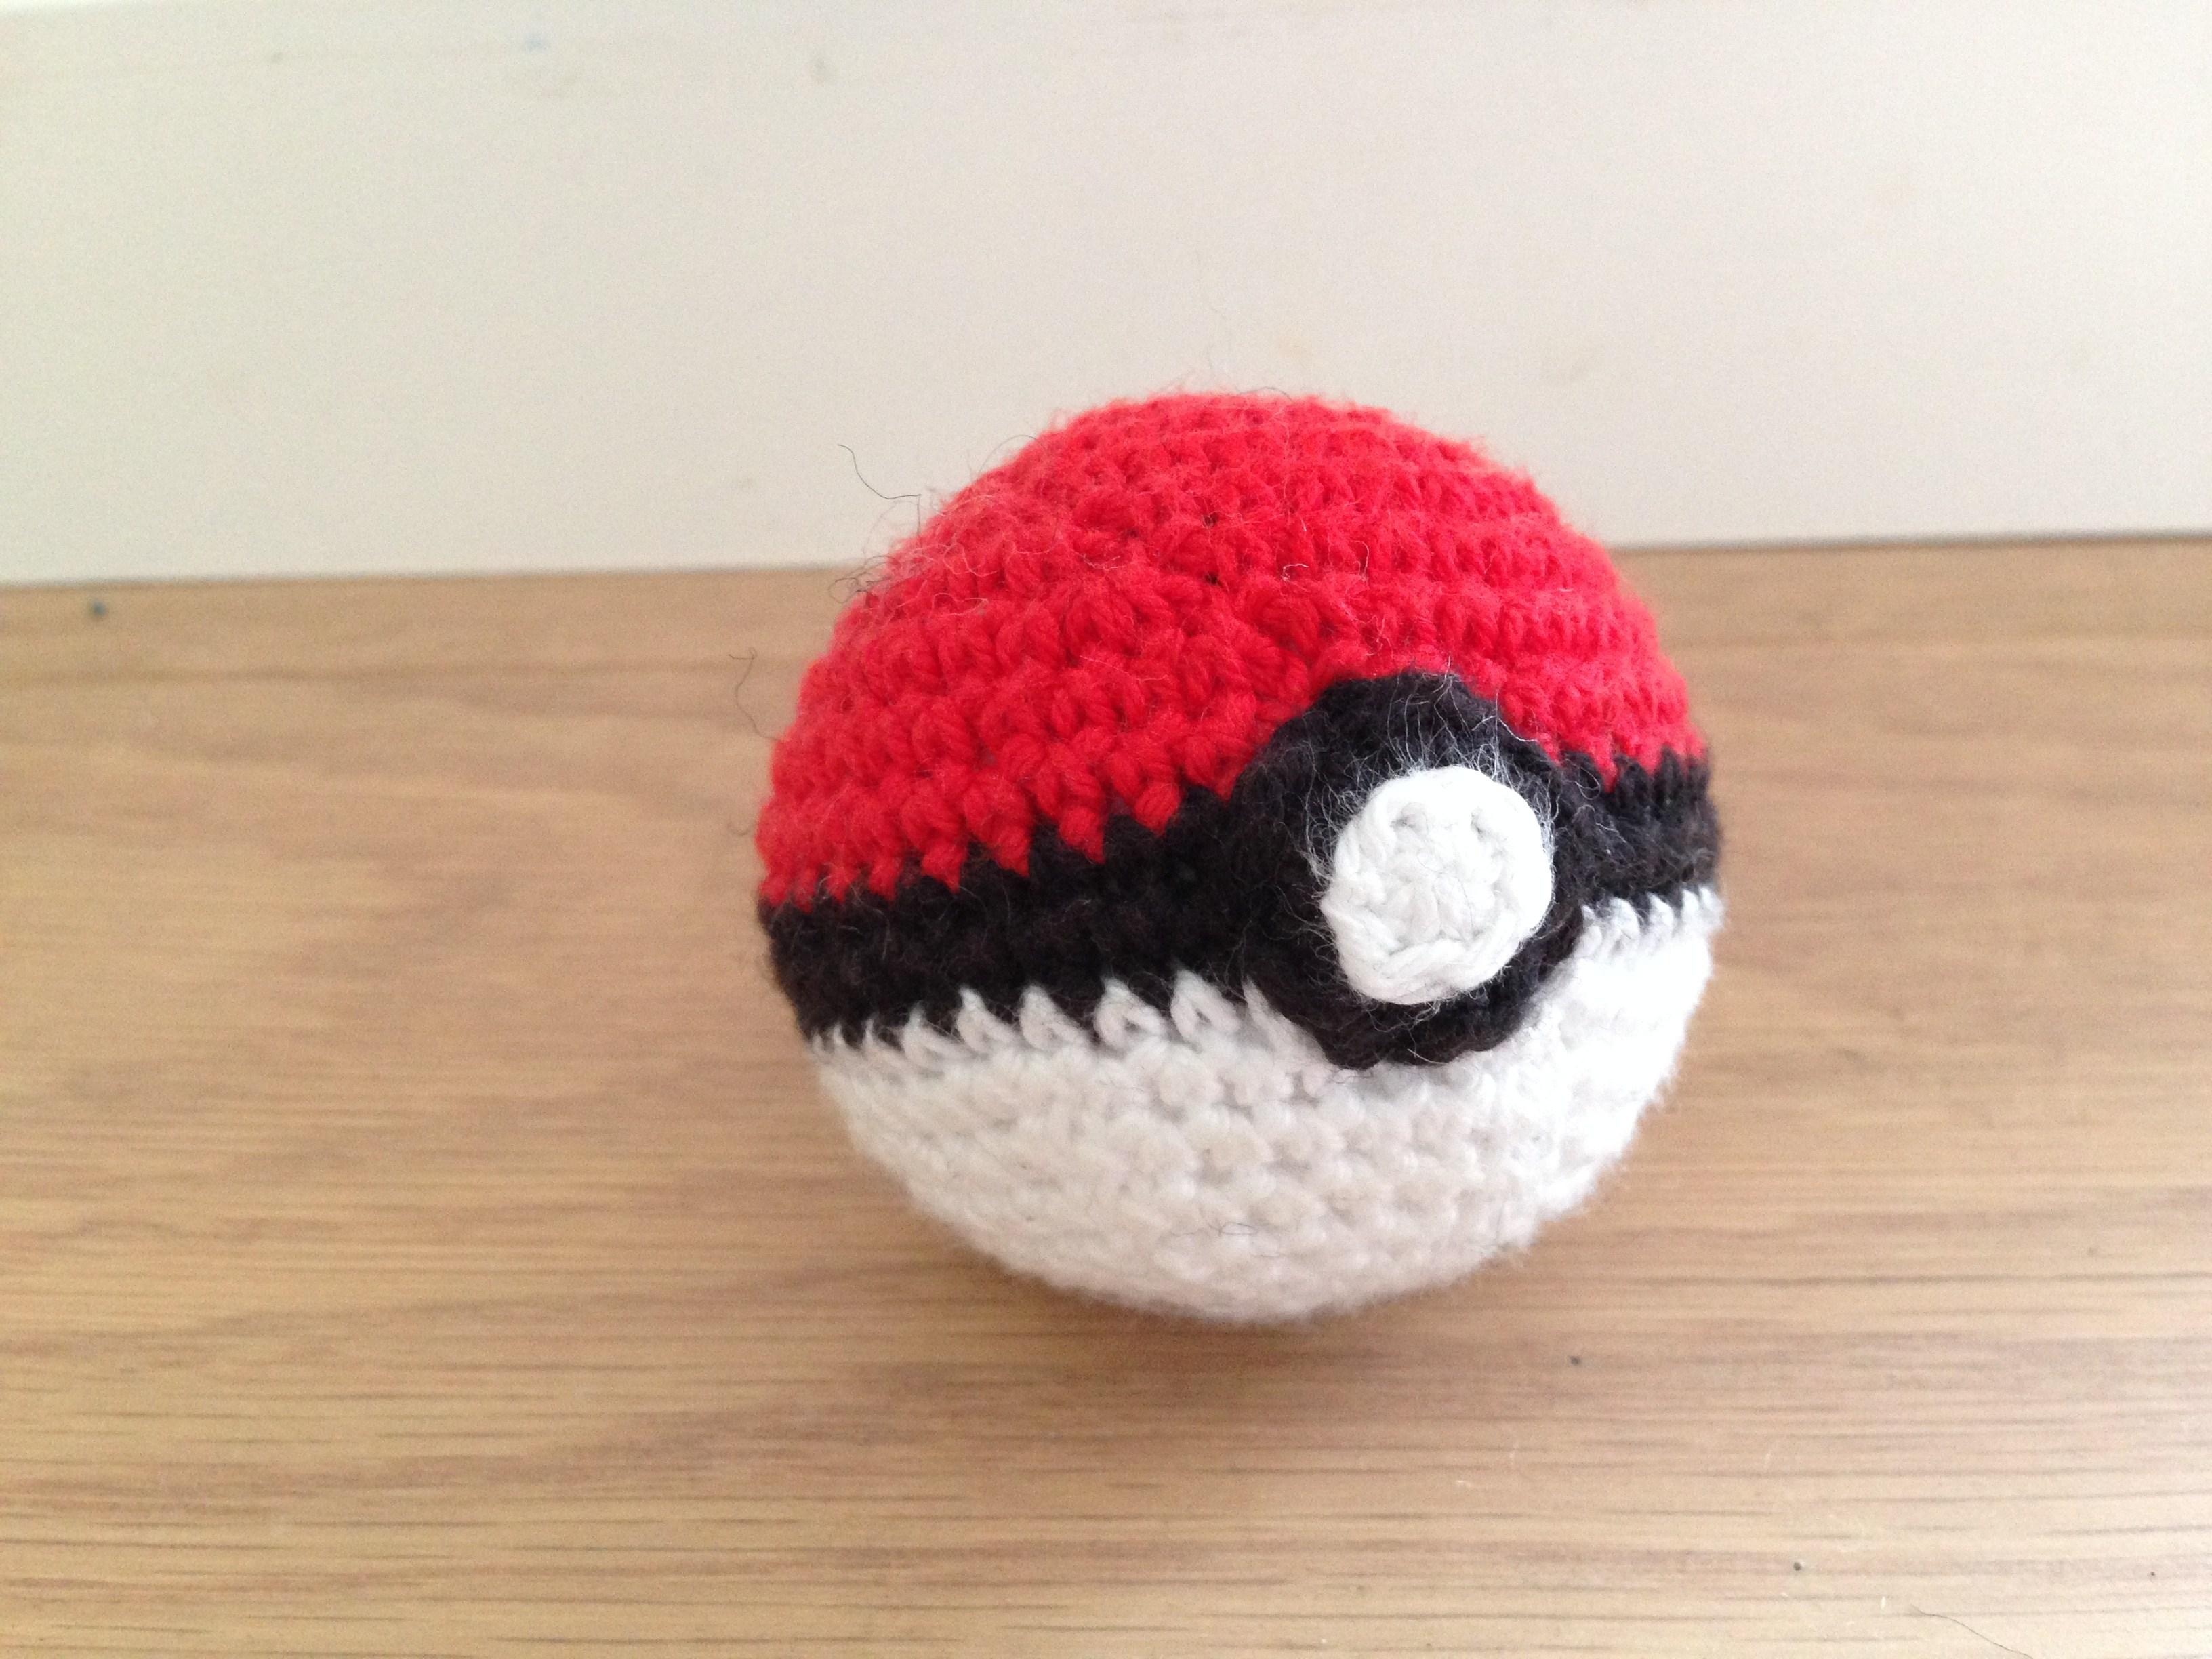 Hæklet pokeball (Pokemon)